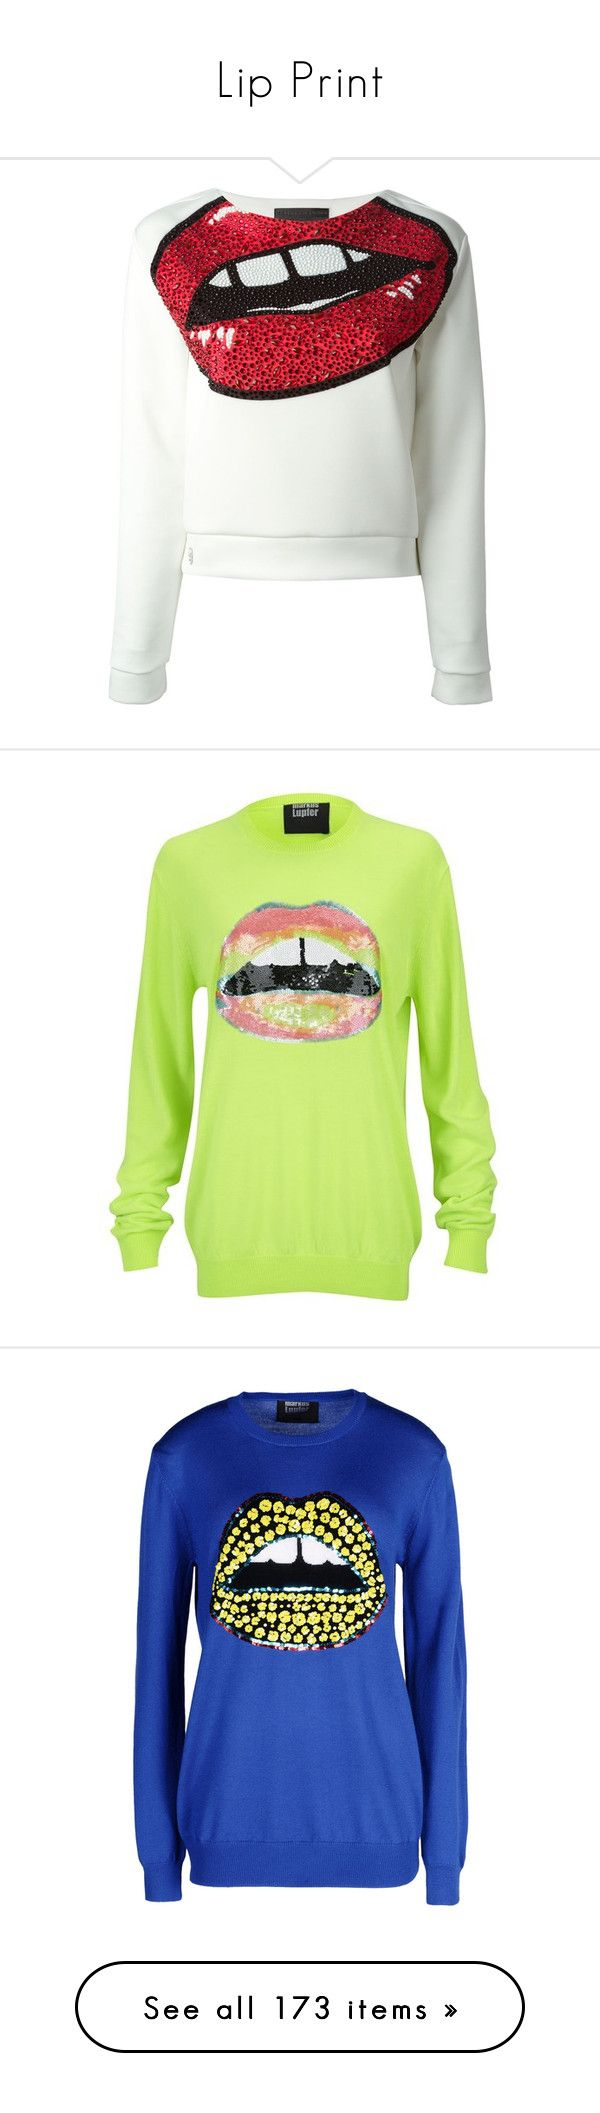 """Lip Print"" by megiem ❤ liked on Polyvore featuring tops, hoodies, sweatshirts, sweaters, sweatshirt, shirts, white, shirts & tops, multicolor shirt and philipp plein"